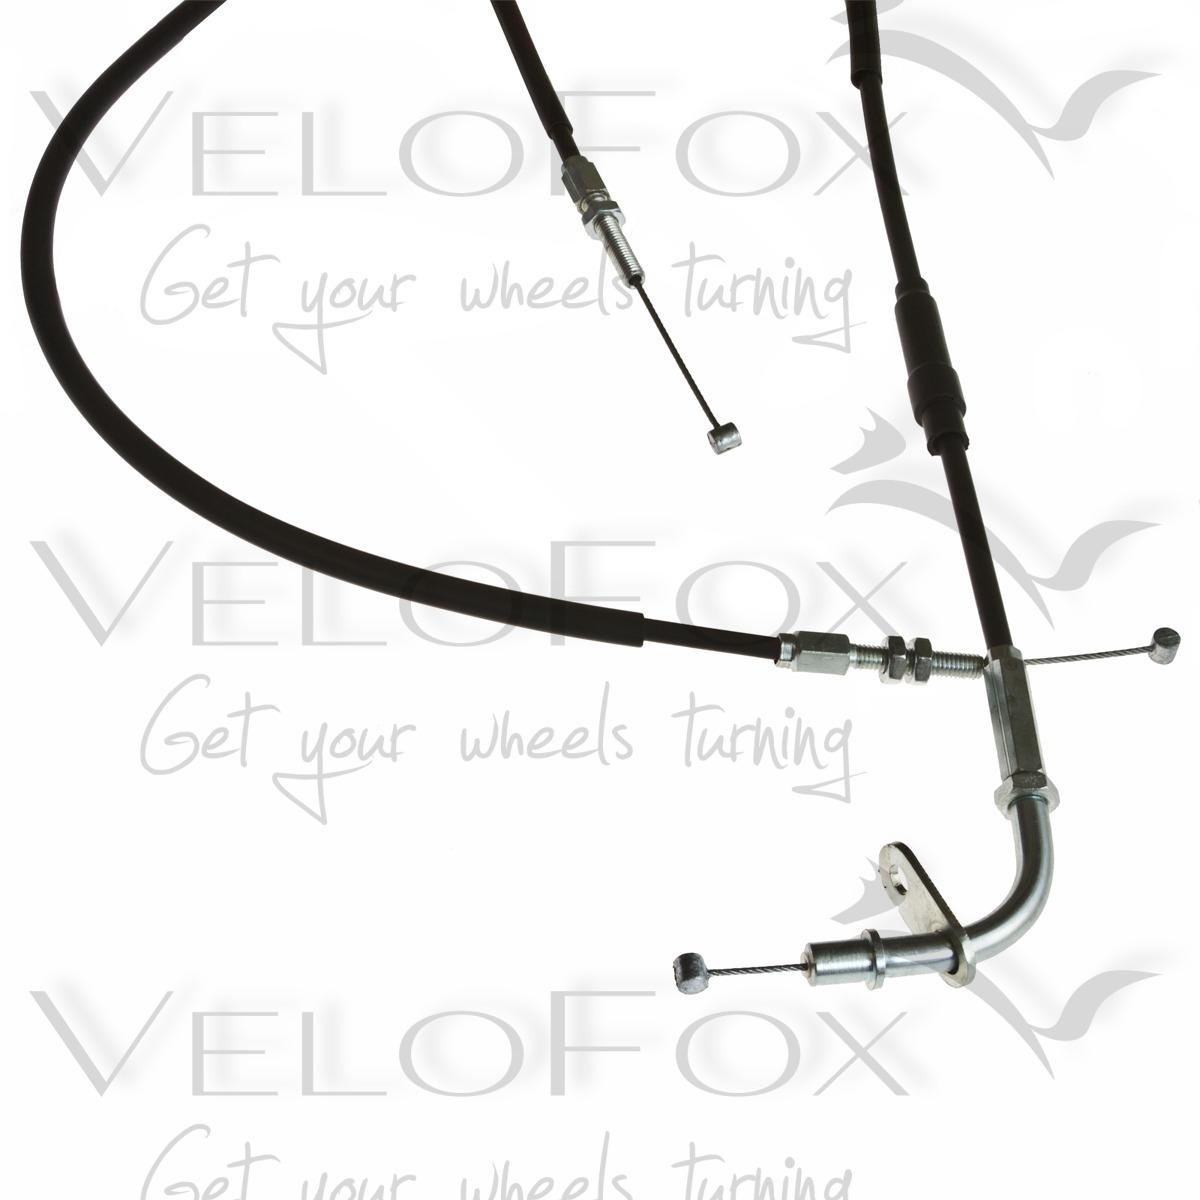 JMT Throttle Cable Open fits Suzuki VS 1400 GLP Intruder